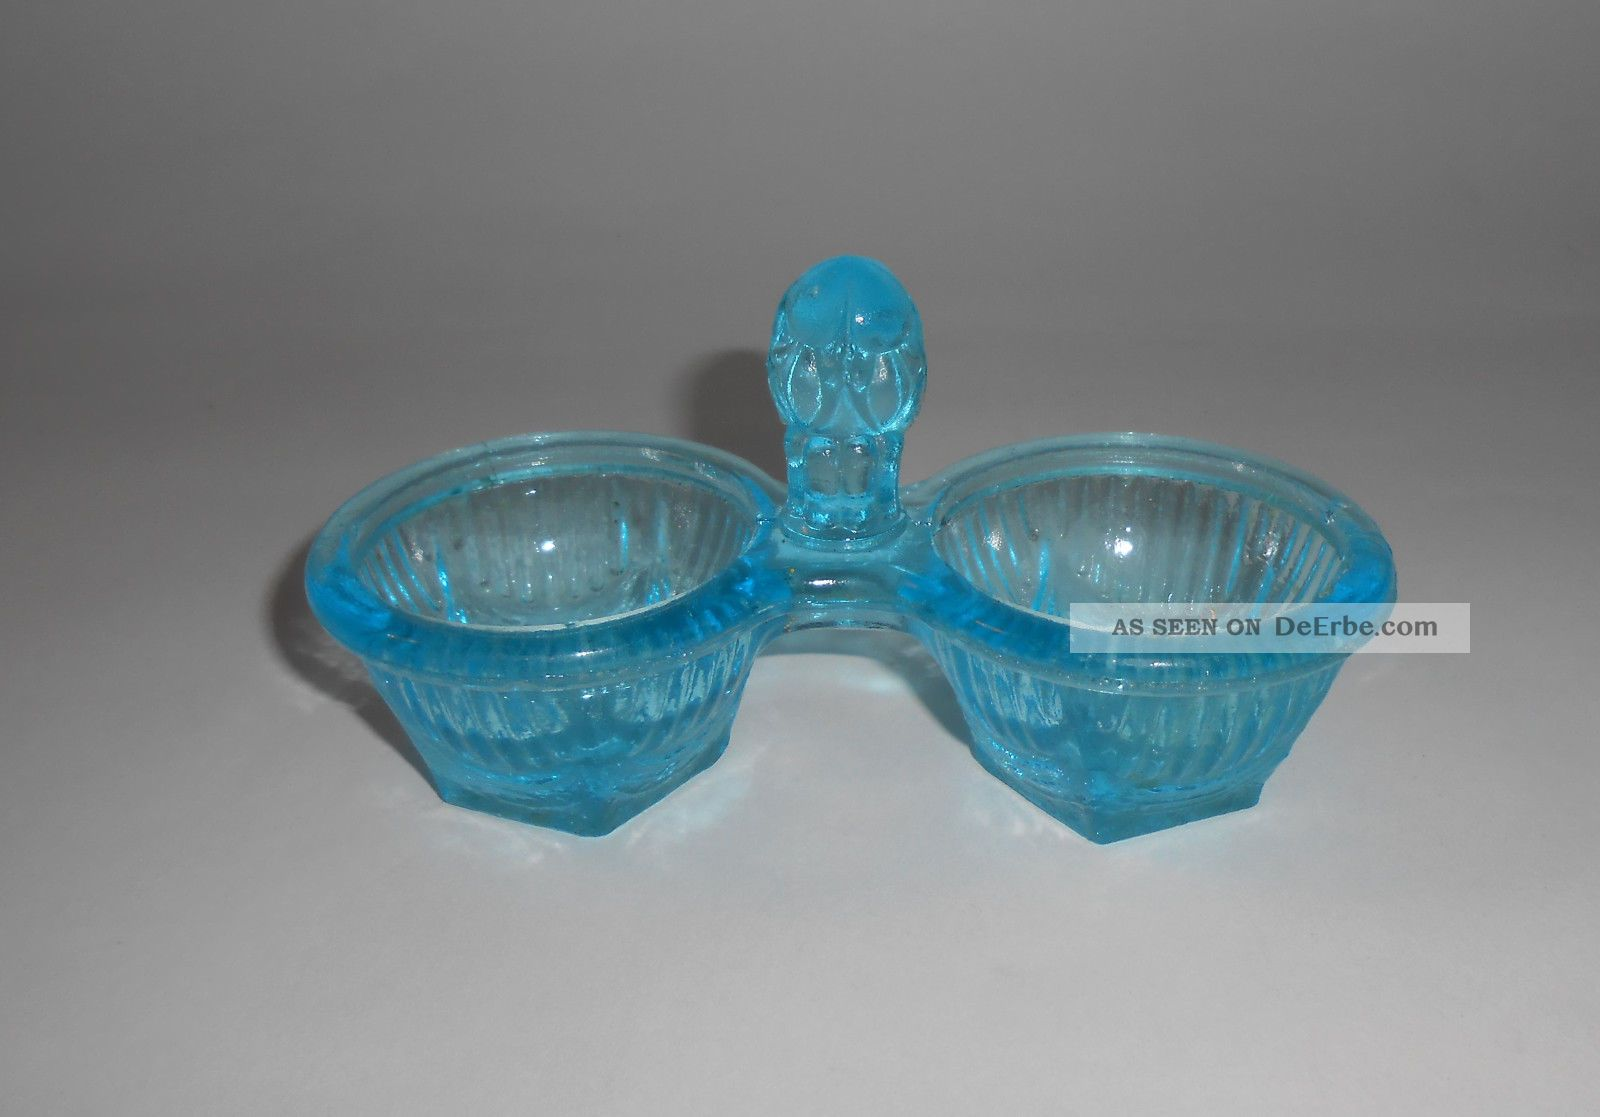 Antike Blaue Salz Pfeffer Menage Aus Pressglas Ca.  1920 Sammlerglas Bild